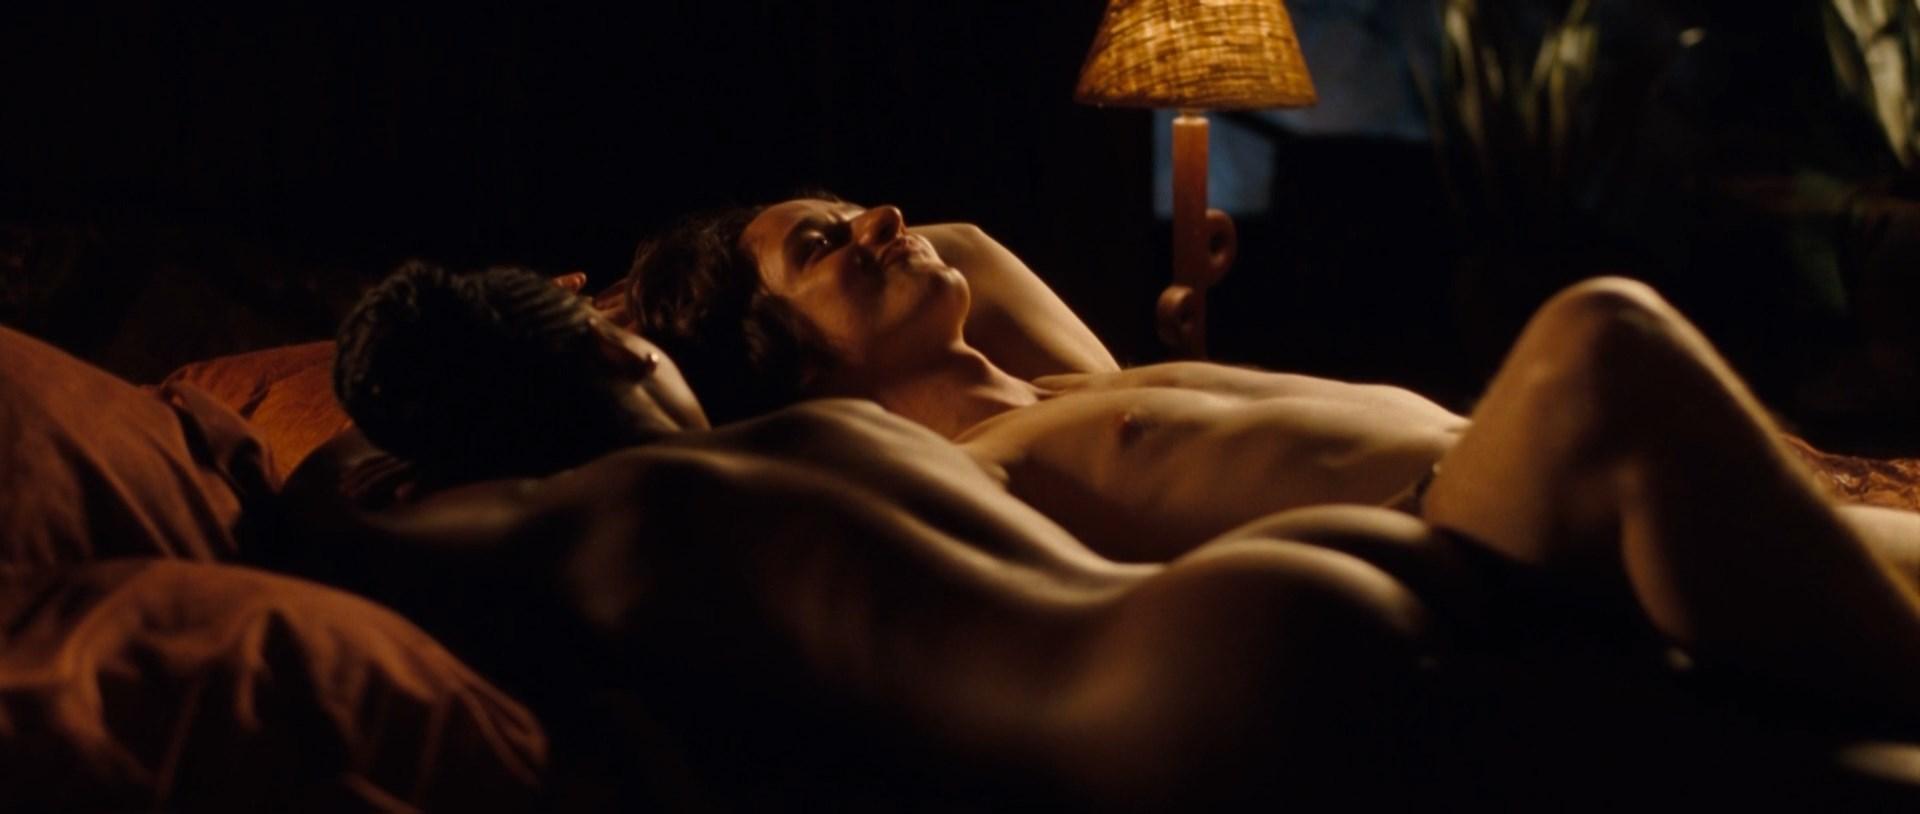 Last king of scotland kerry washington nude